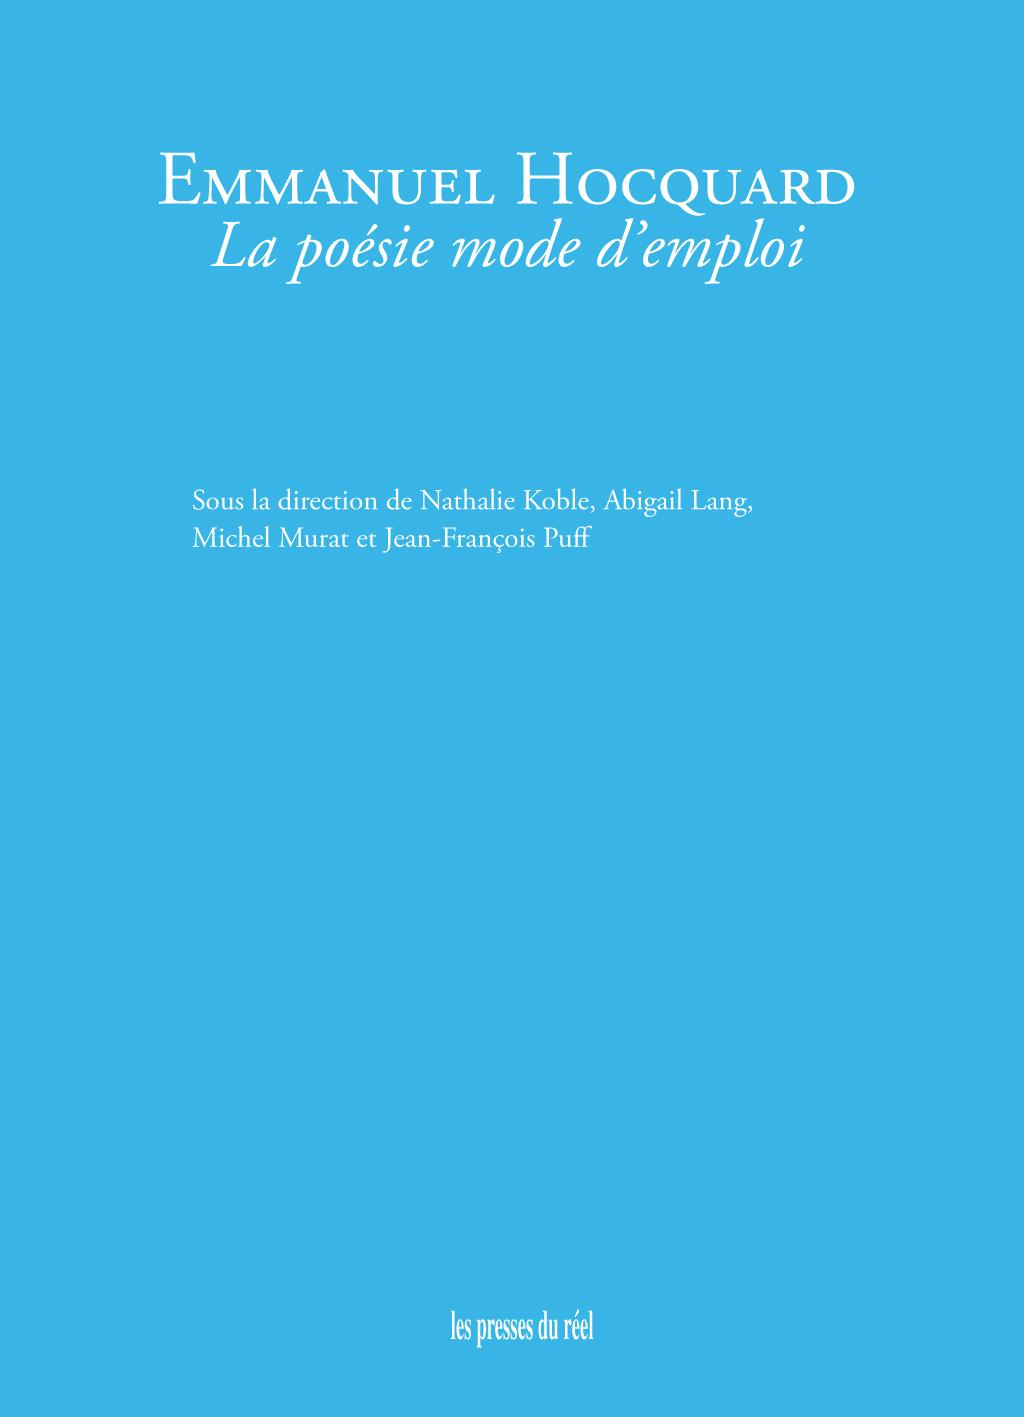 N. Koble, A. Lang, M. Murat, J.-Fr. Puff (dir.), Emmanuel Hocquard. La poésie mode d'emploi